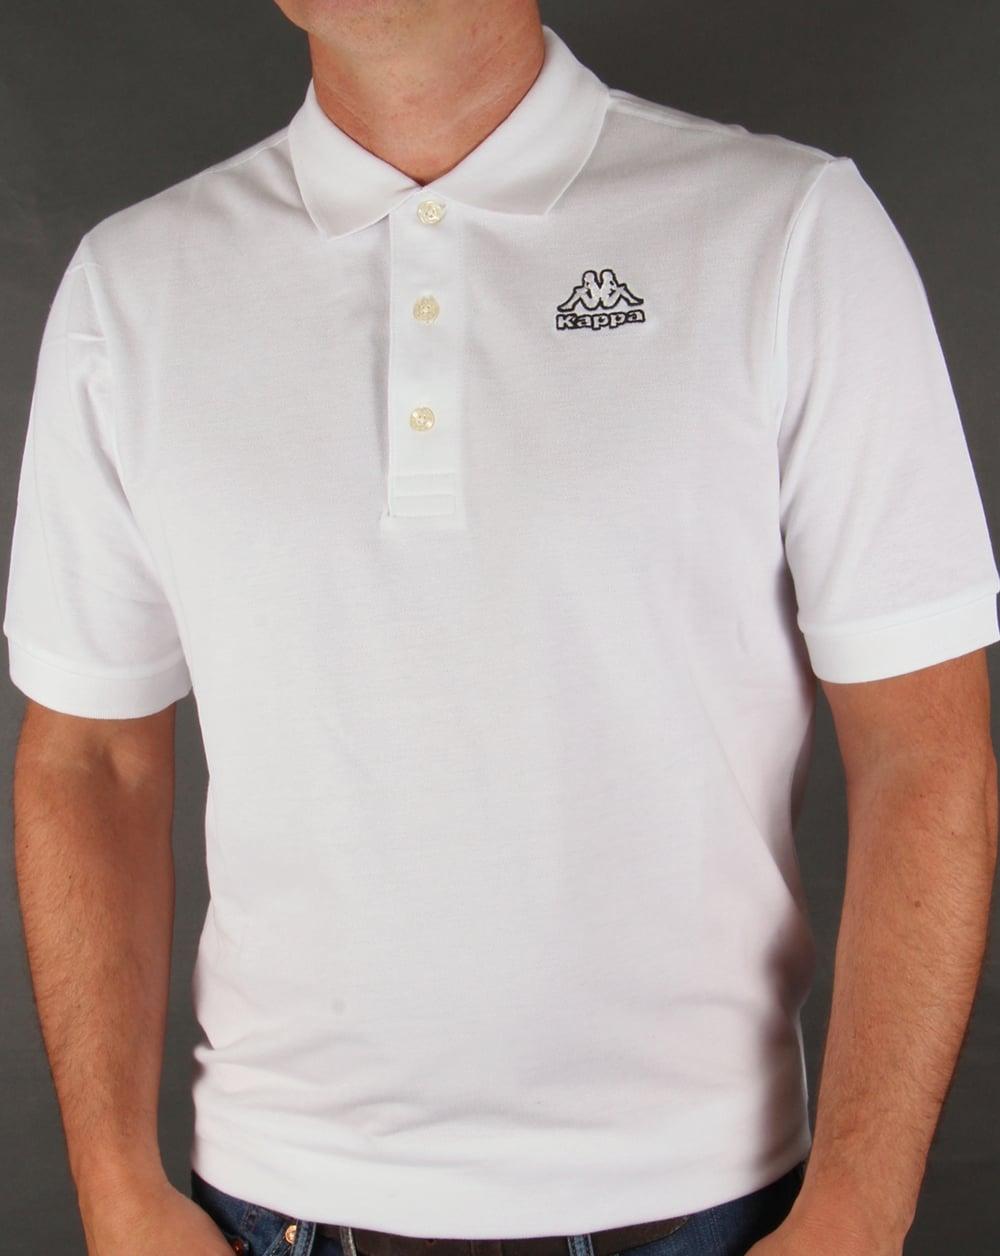 e2a2e7e2b8db Kappa Kappa Omini Polo Shirt White